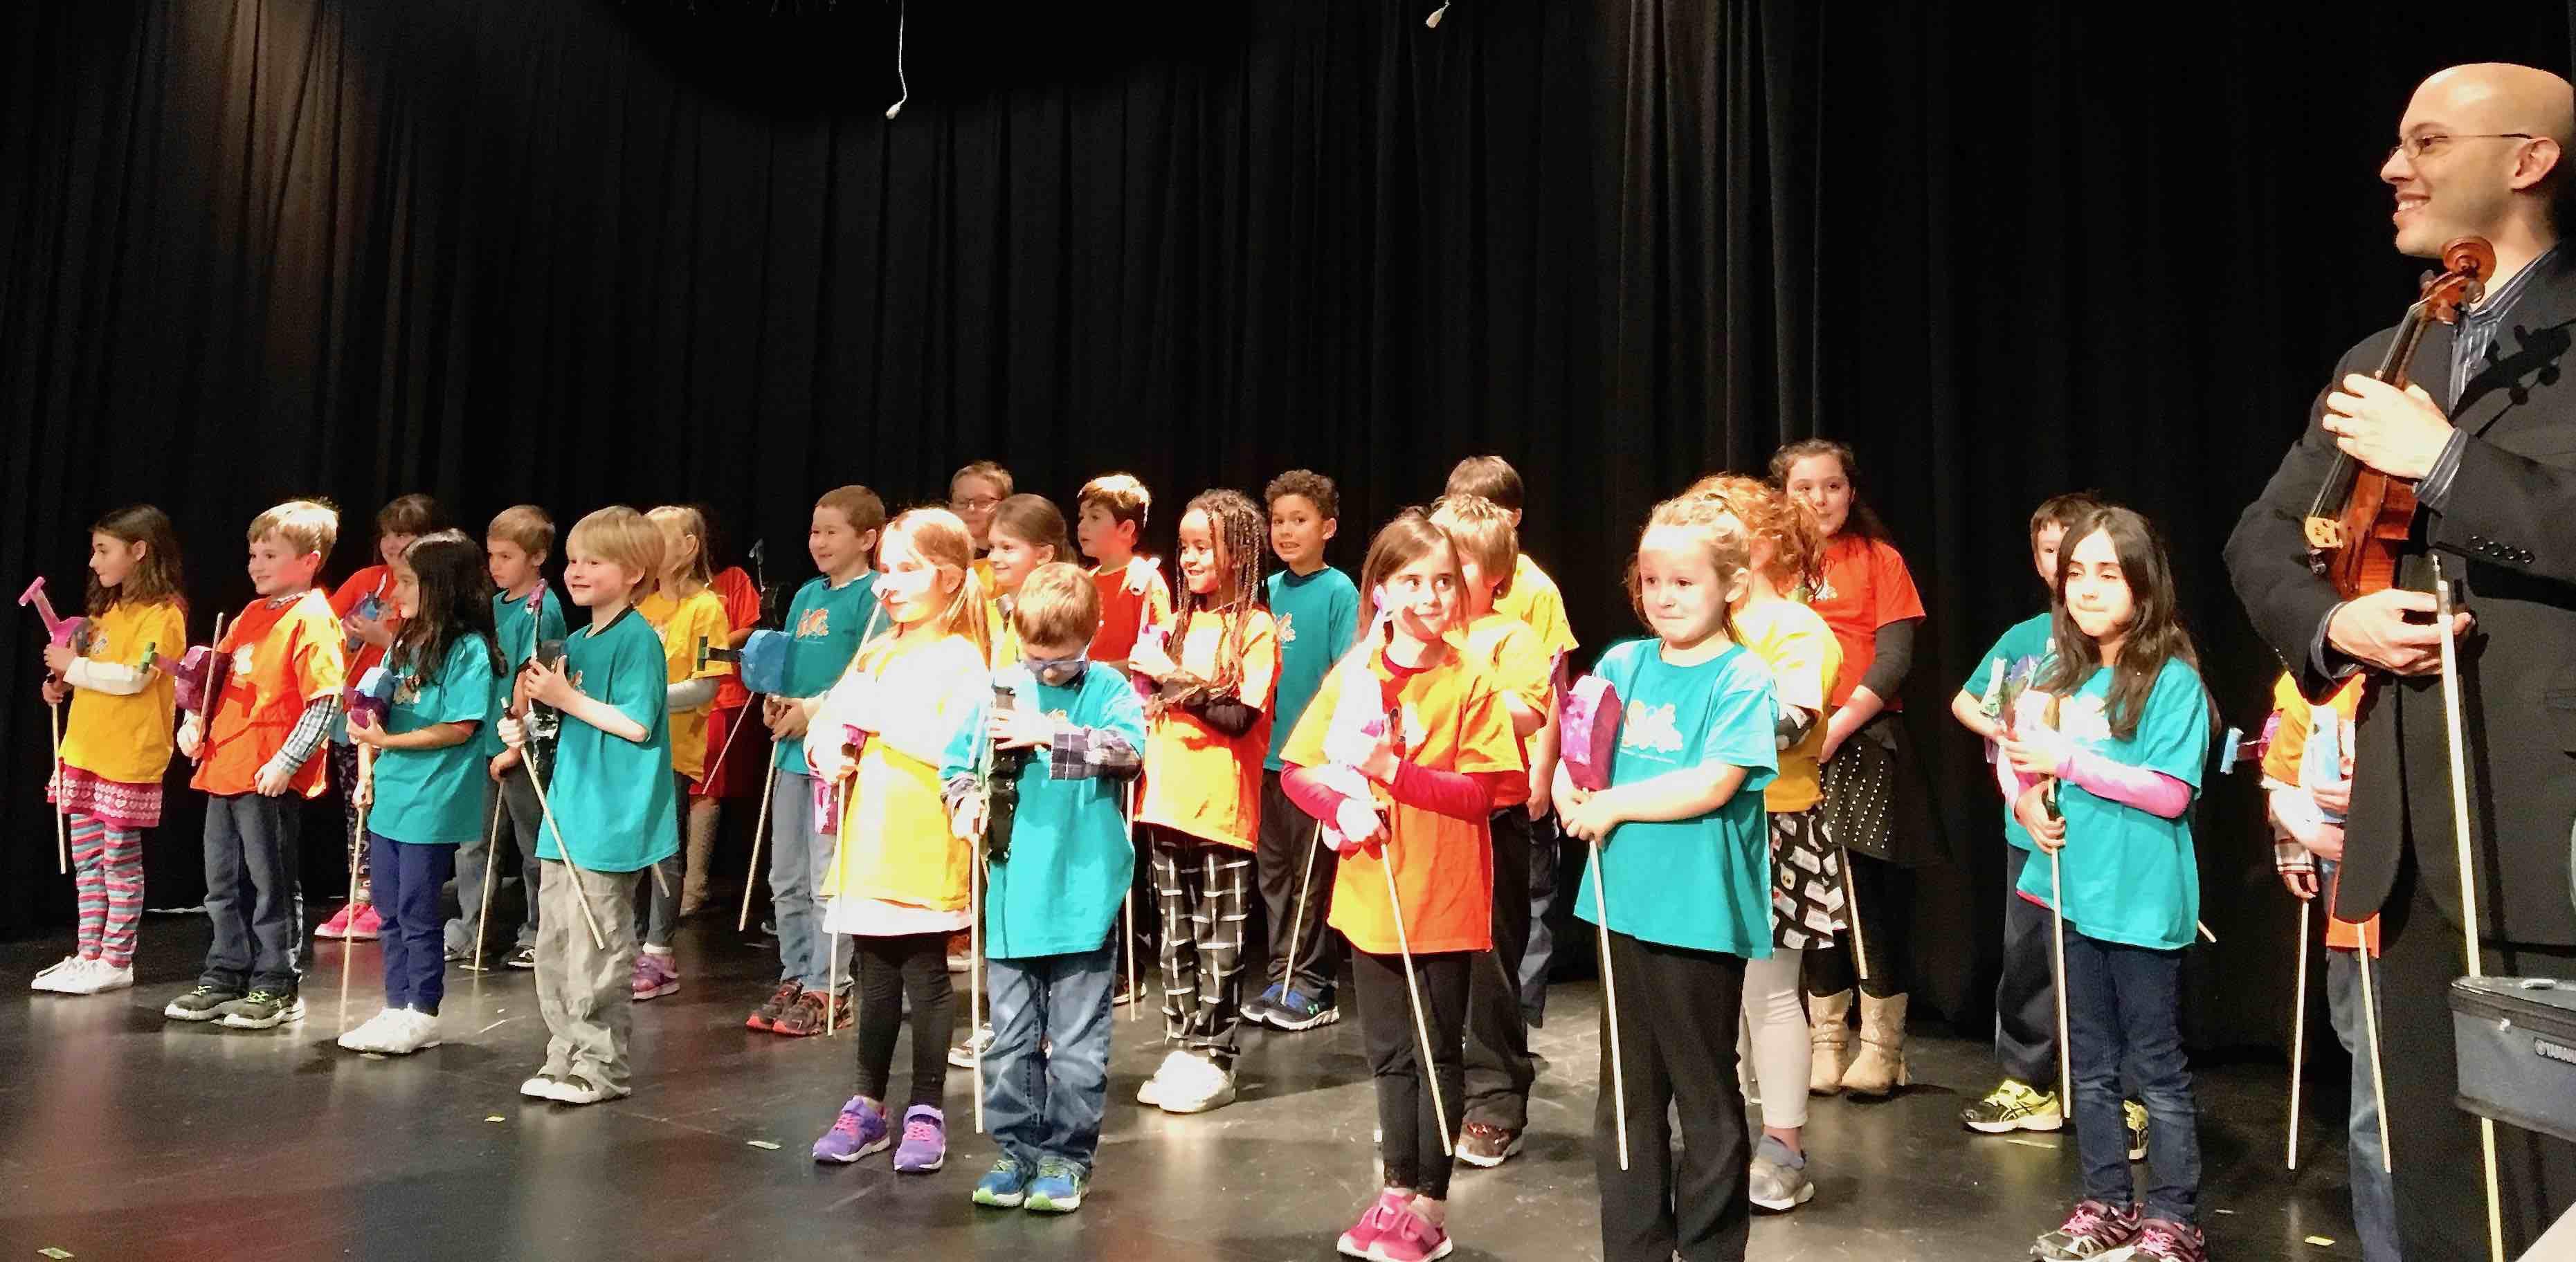 February 20, 2018 Sistema NB Fredericton Instrument Presentation Ceremony at Gibson-Neill Memorial School